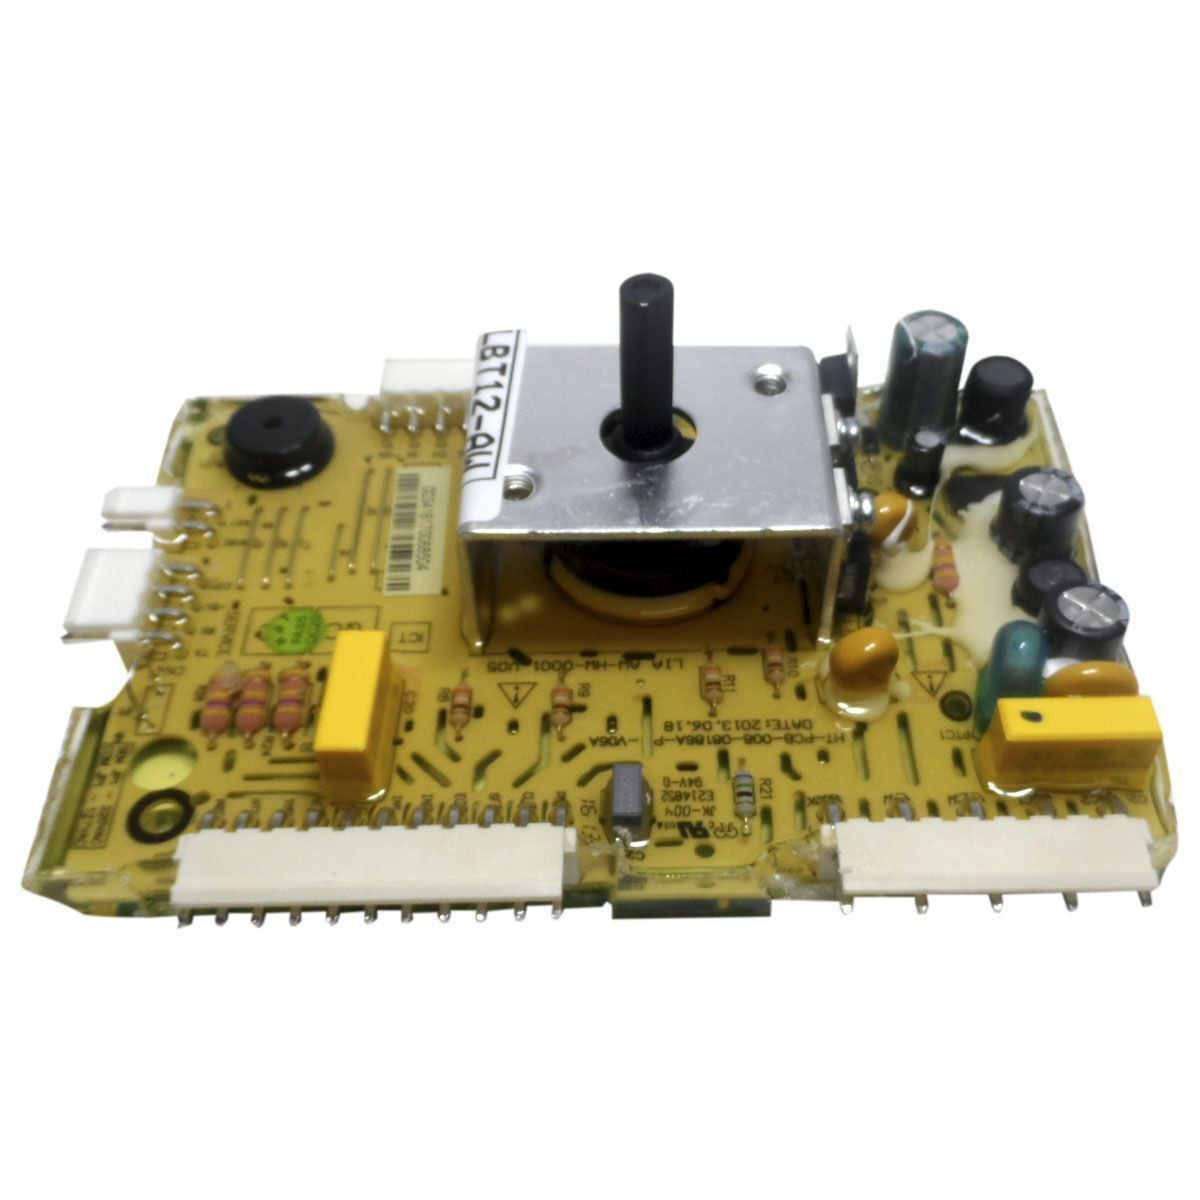 Placa Eletrôica Potência Lavadora Electrolux 70200648